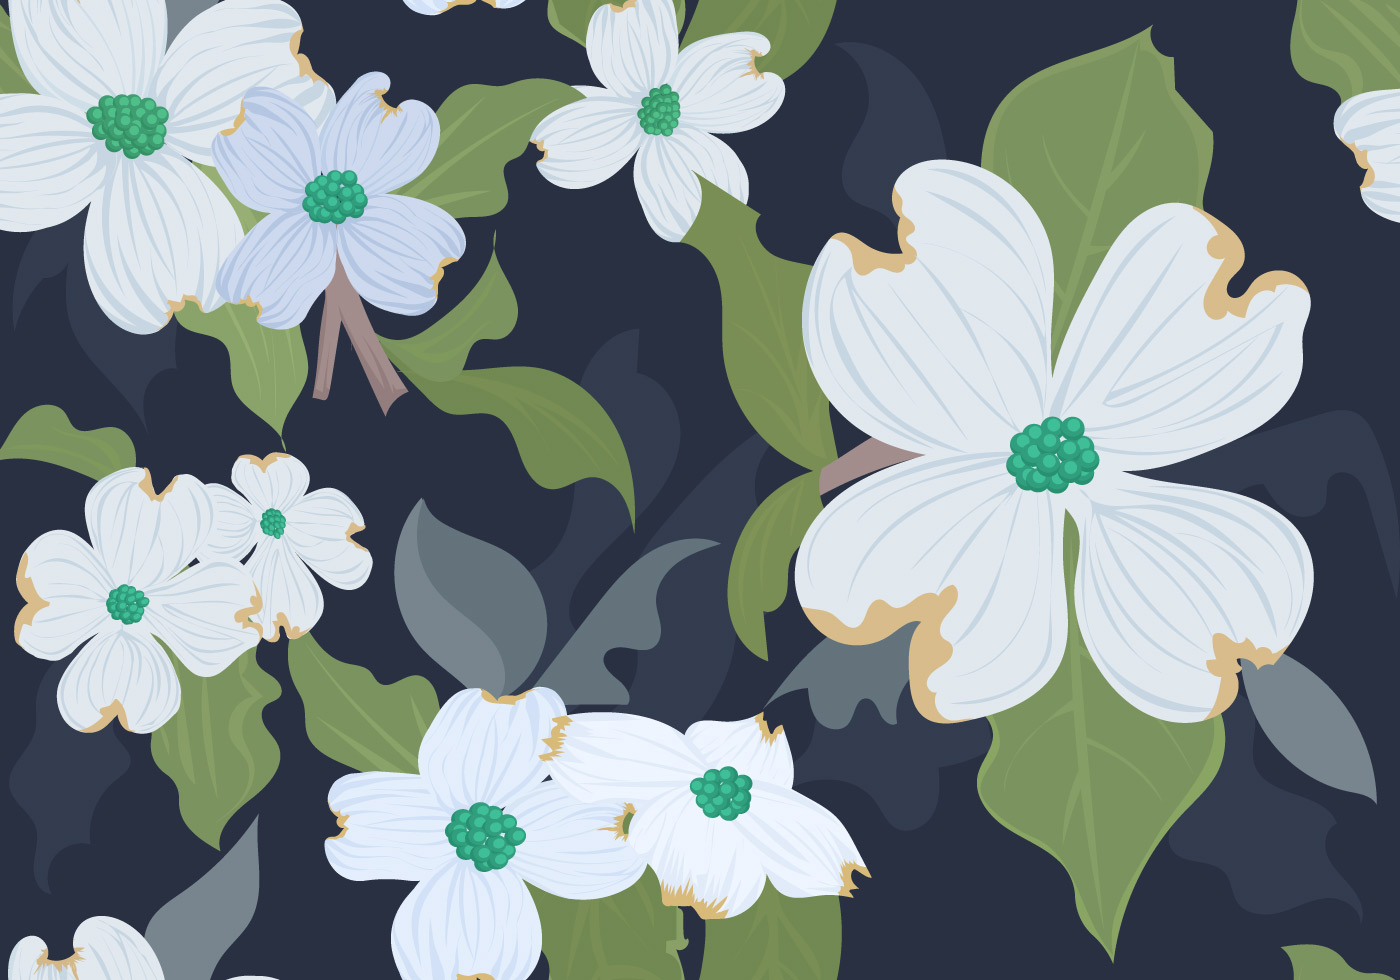 White dogwood floral seamless pattern download free vector art white dogwood floral seamless pattern download free vector art stock graphics images izmirmasajfo